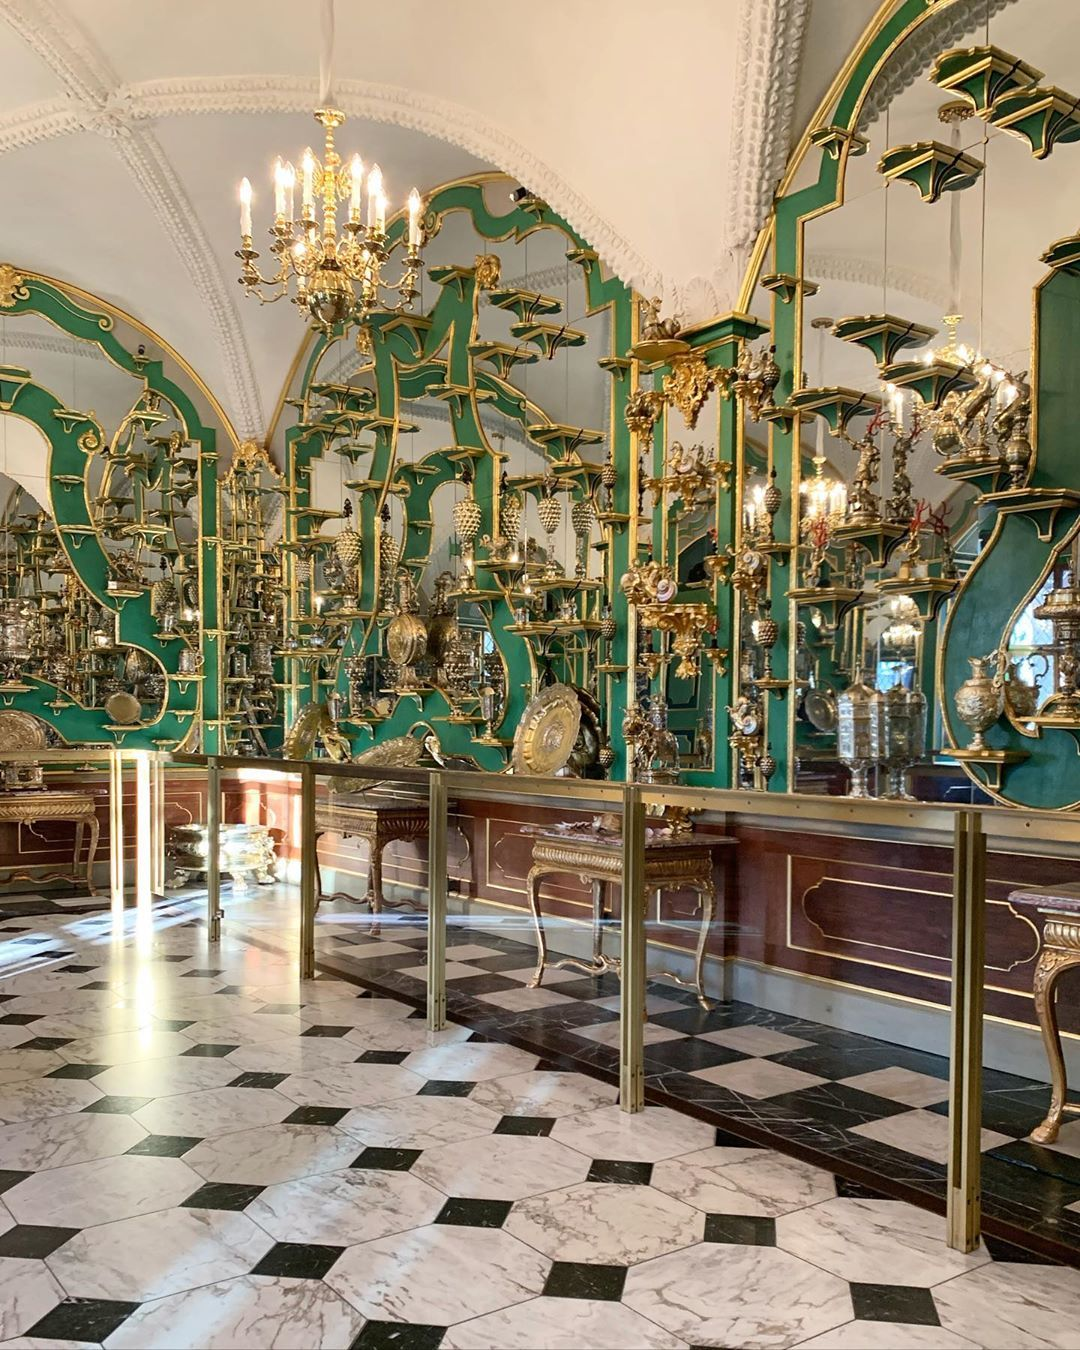 Elizabeth De Montfort Walker On Instagram I Ve Just Heard The News Of The Heist At The Grunes Gewolbe In Dresden And I A In 2020 Dresden Instagram Furnishings Design